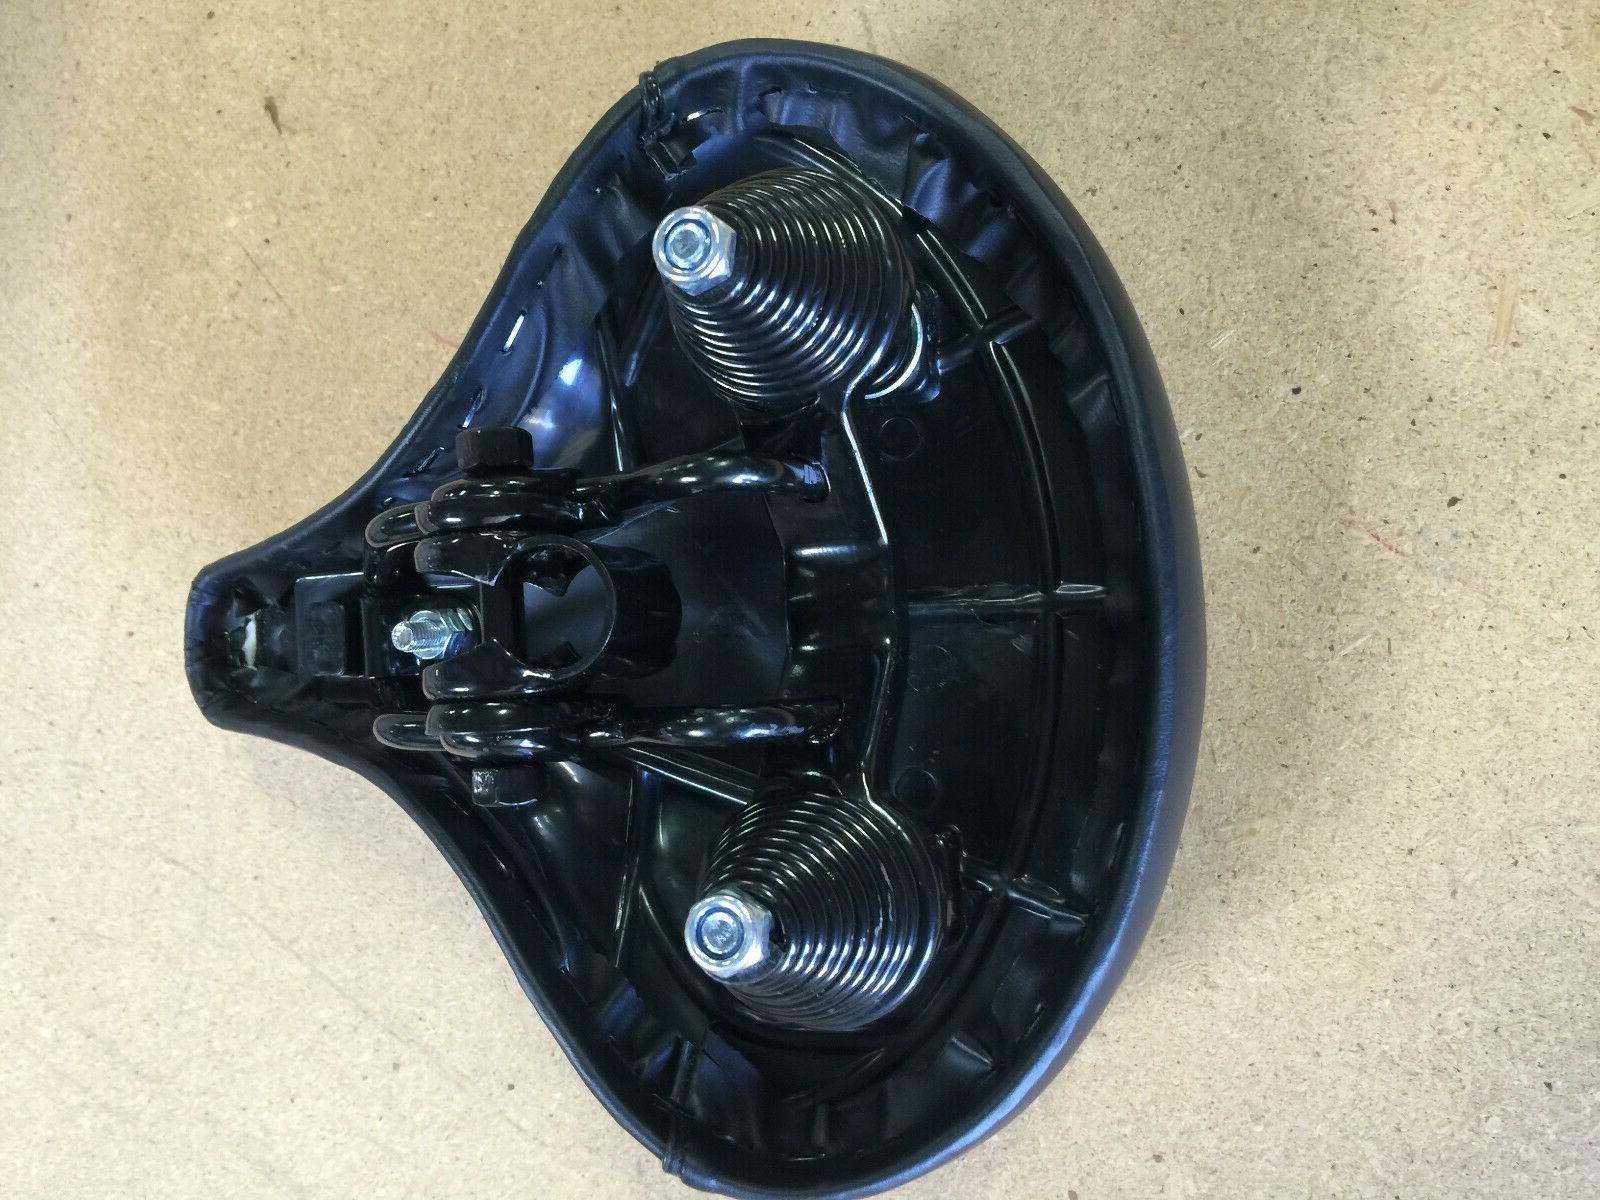 Beach Cruiser Chopper Bicycle Saddle Seat : Black